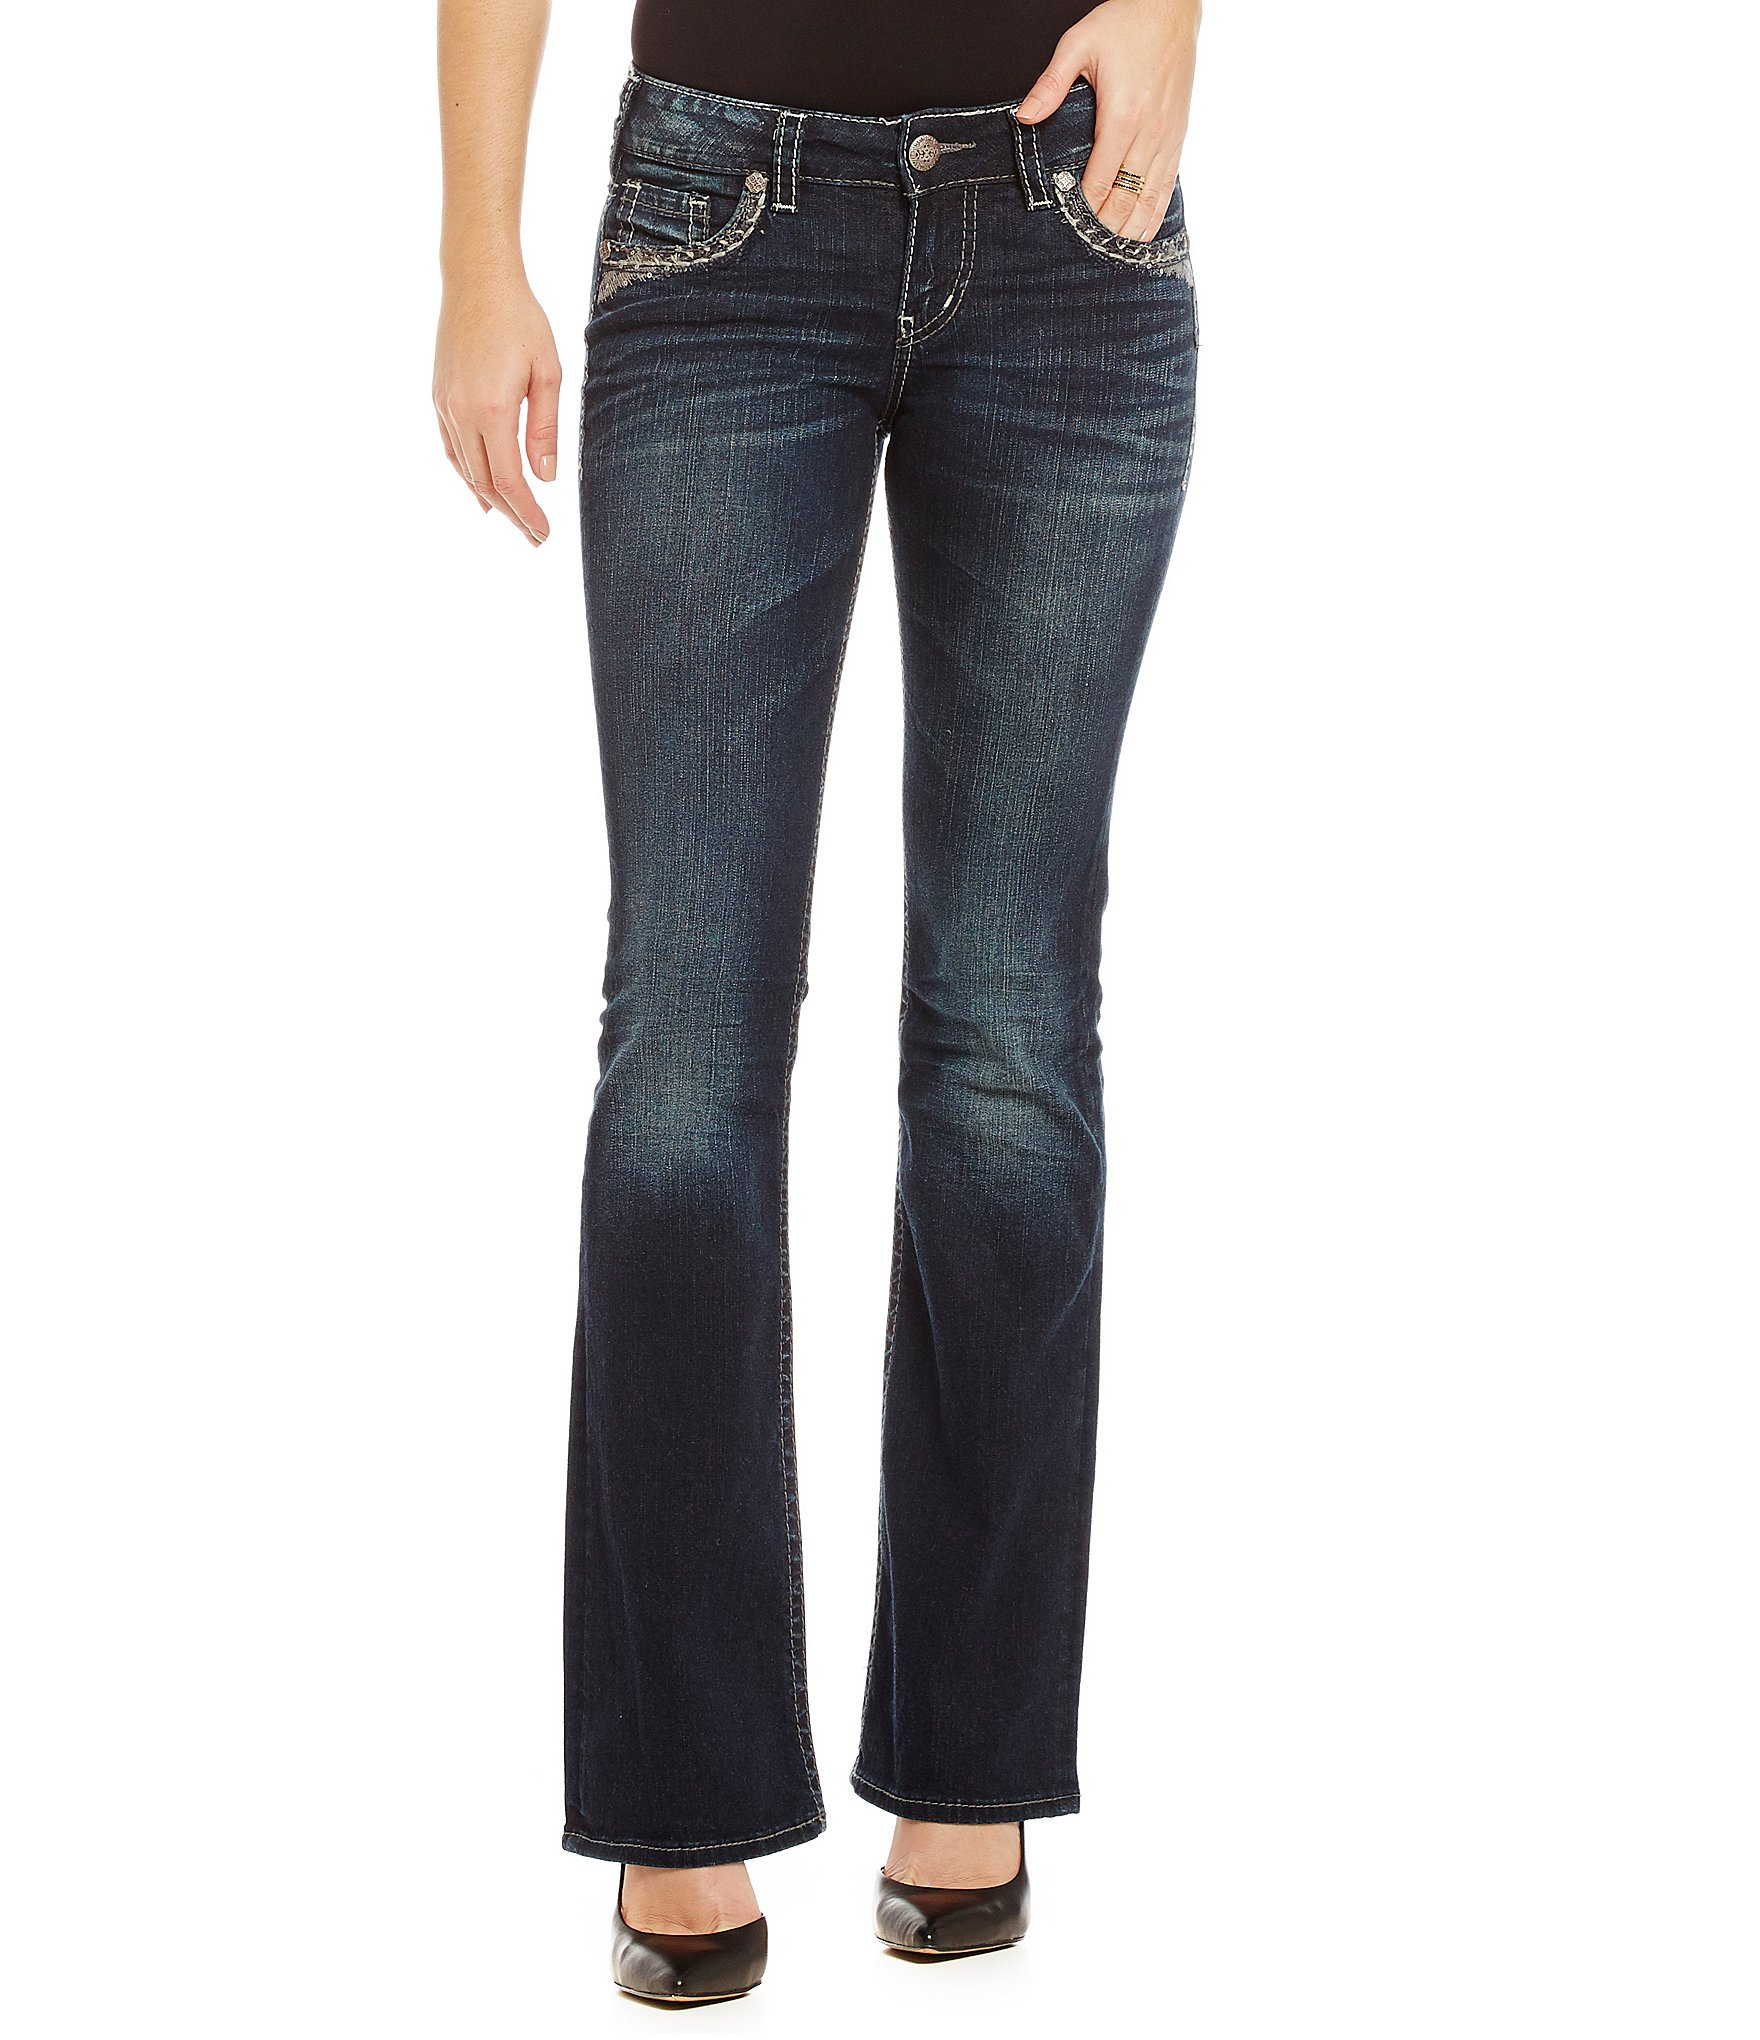 silver jeans co suki mid rise stretch denim bootcut jeans dillards. Black Bedroom Furniture Sets. Home Design Ideas